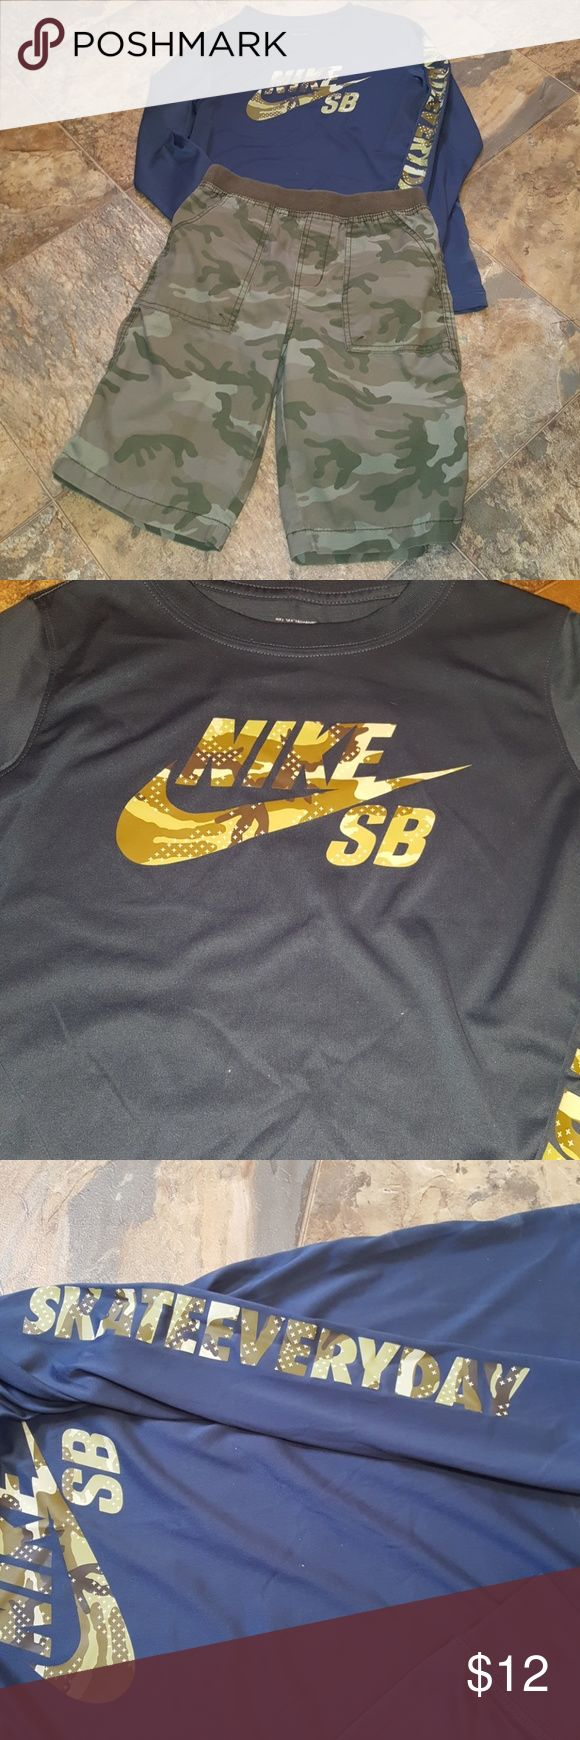 NIKE DRI-FIT TEE & CAMO SHORTS Nike long sleeve Dri-Fit tee and Camo pull on shorts with pockets MlMik V Nike Shirts & Tops Tees - Long Sleeve